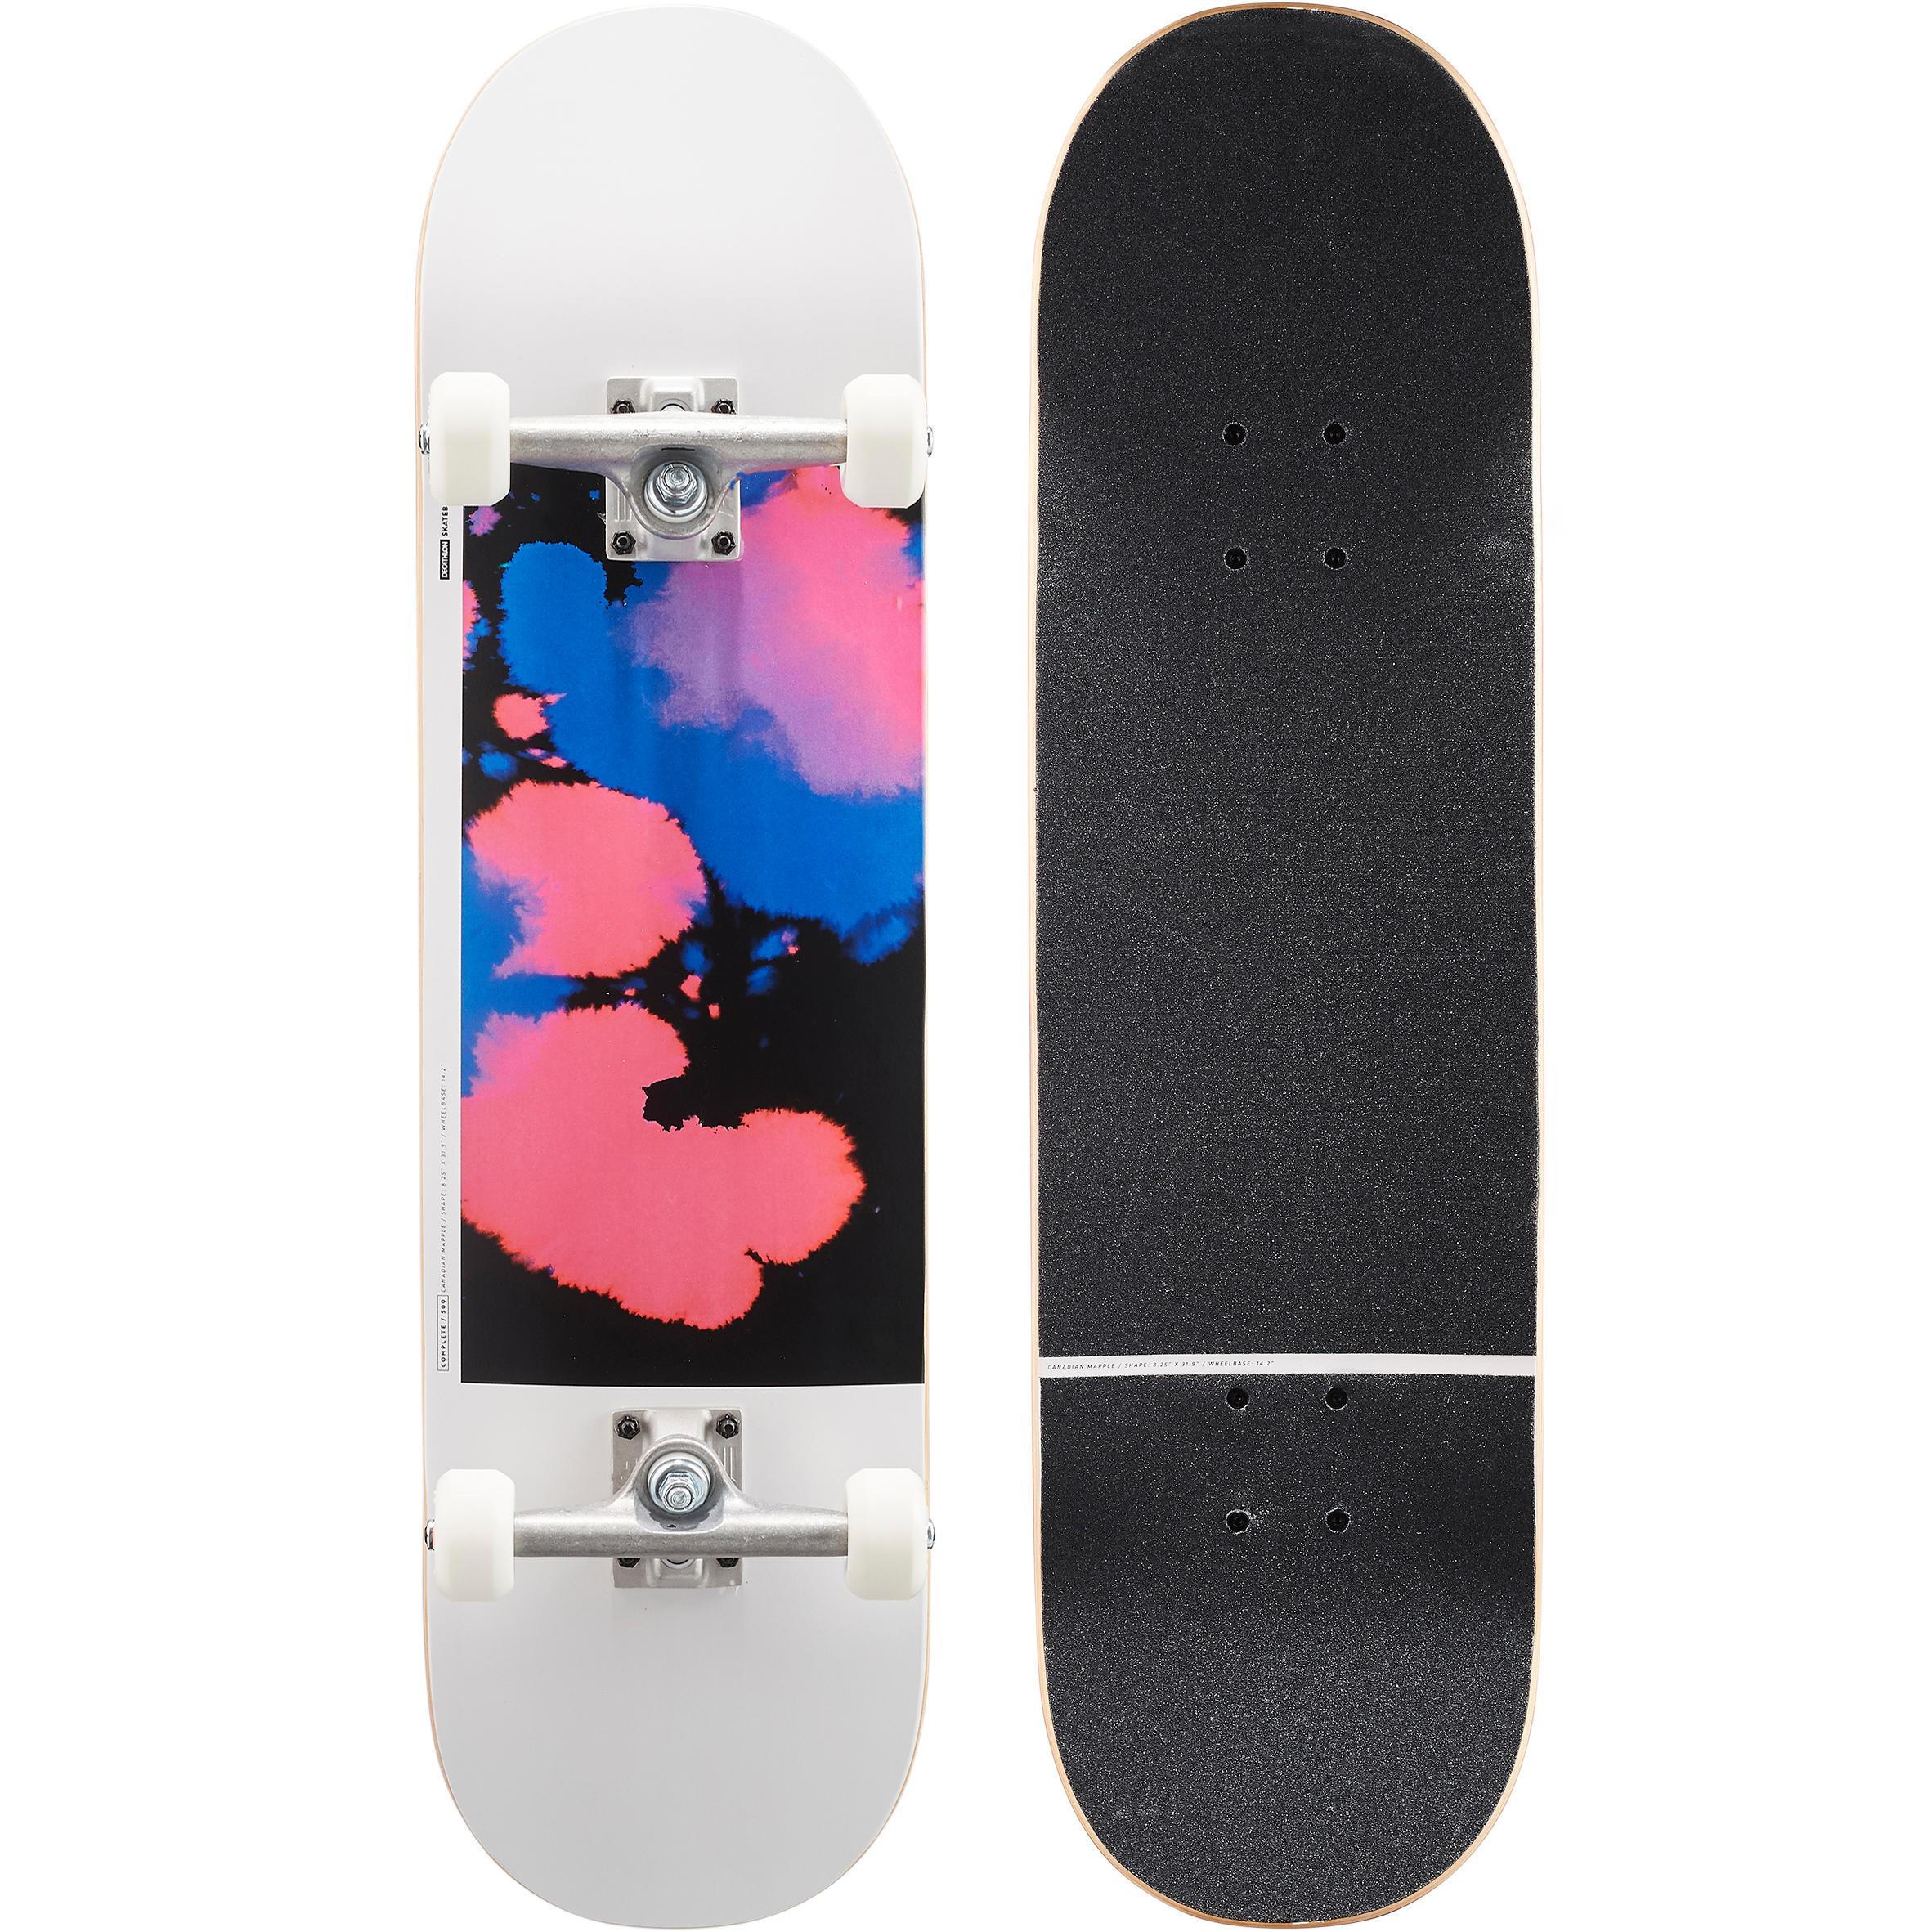 "Skateboard 500 PARANOID 8.25"" imagine"